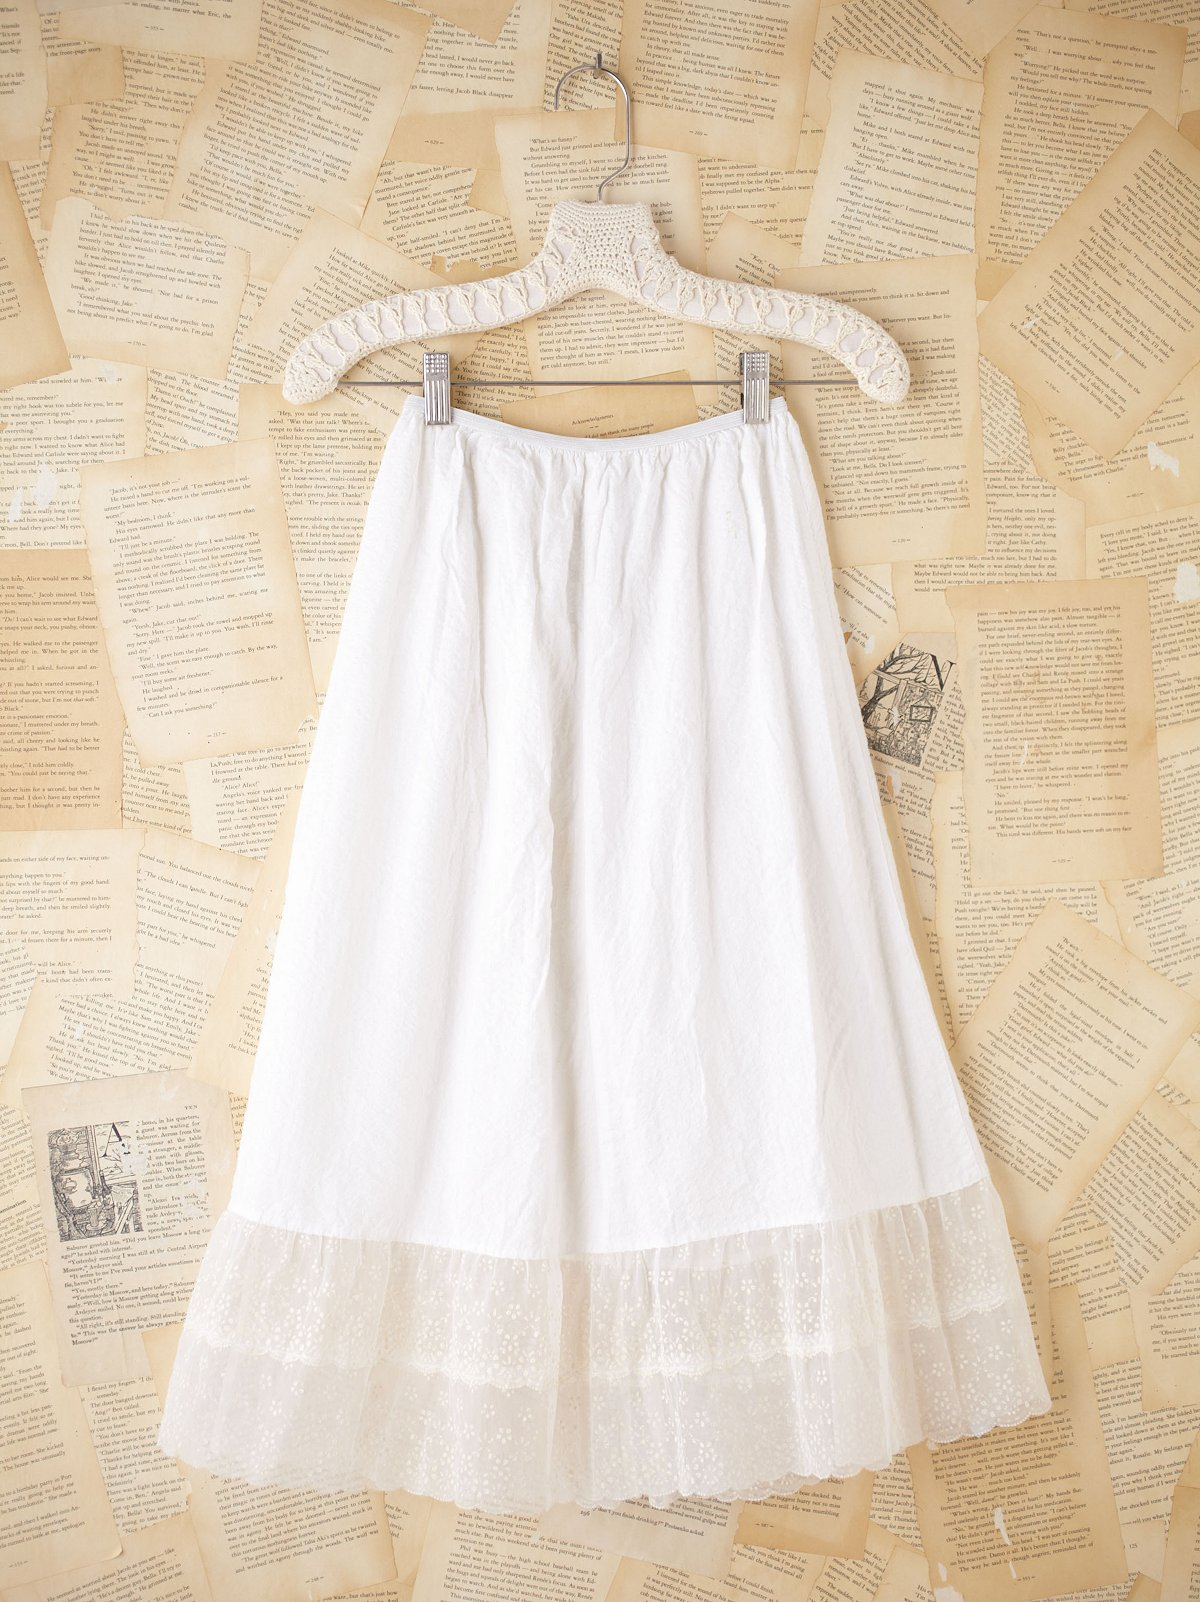 Vintage White Cotton Slip with Sheer Hem